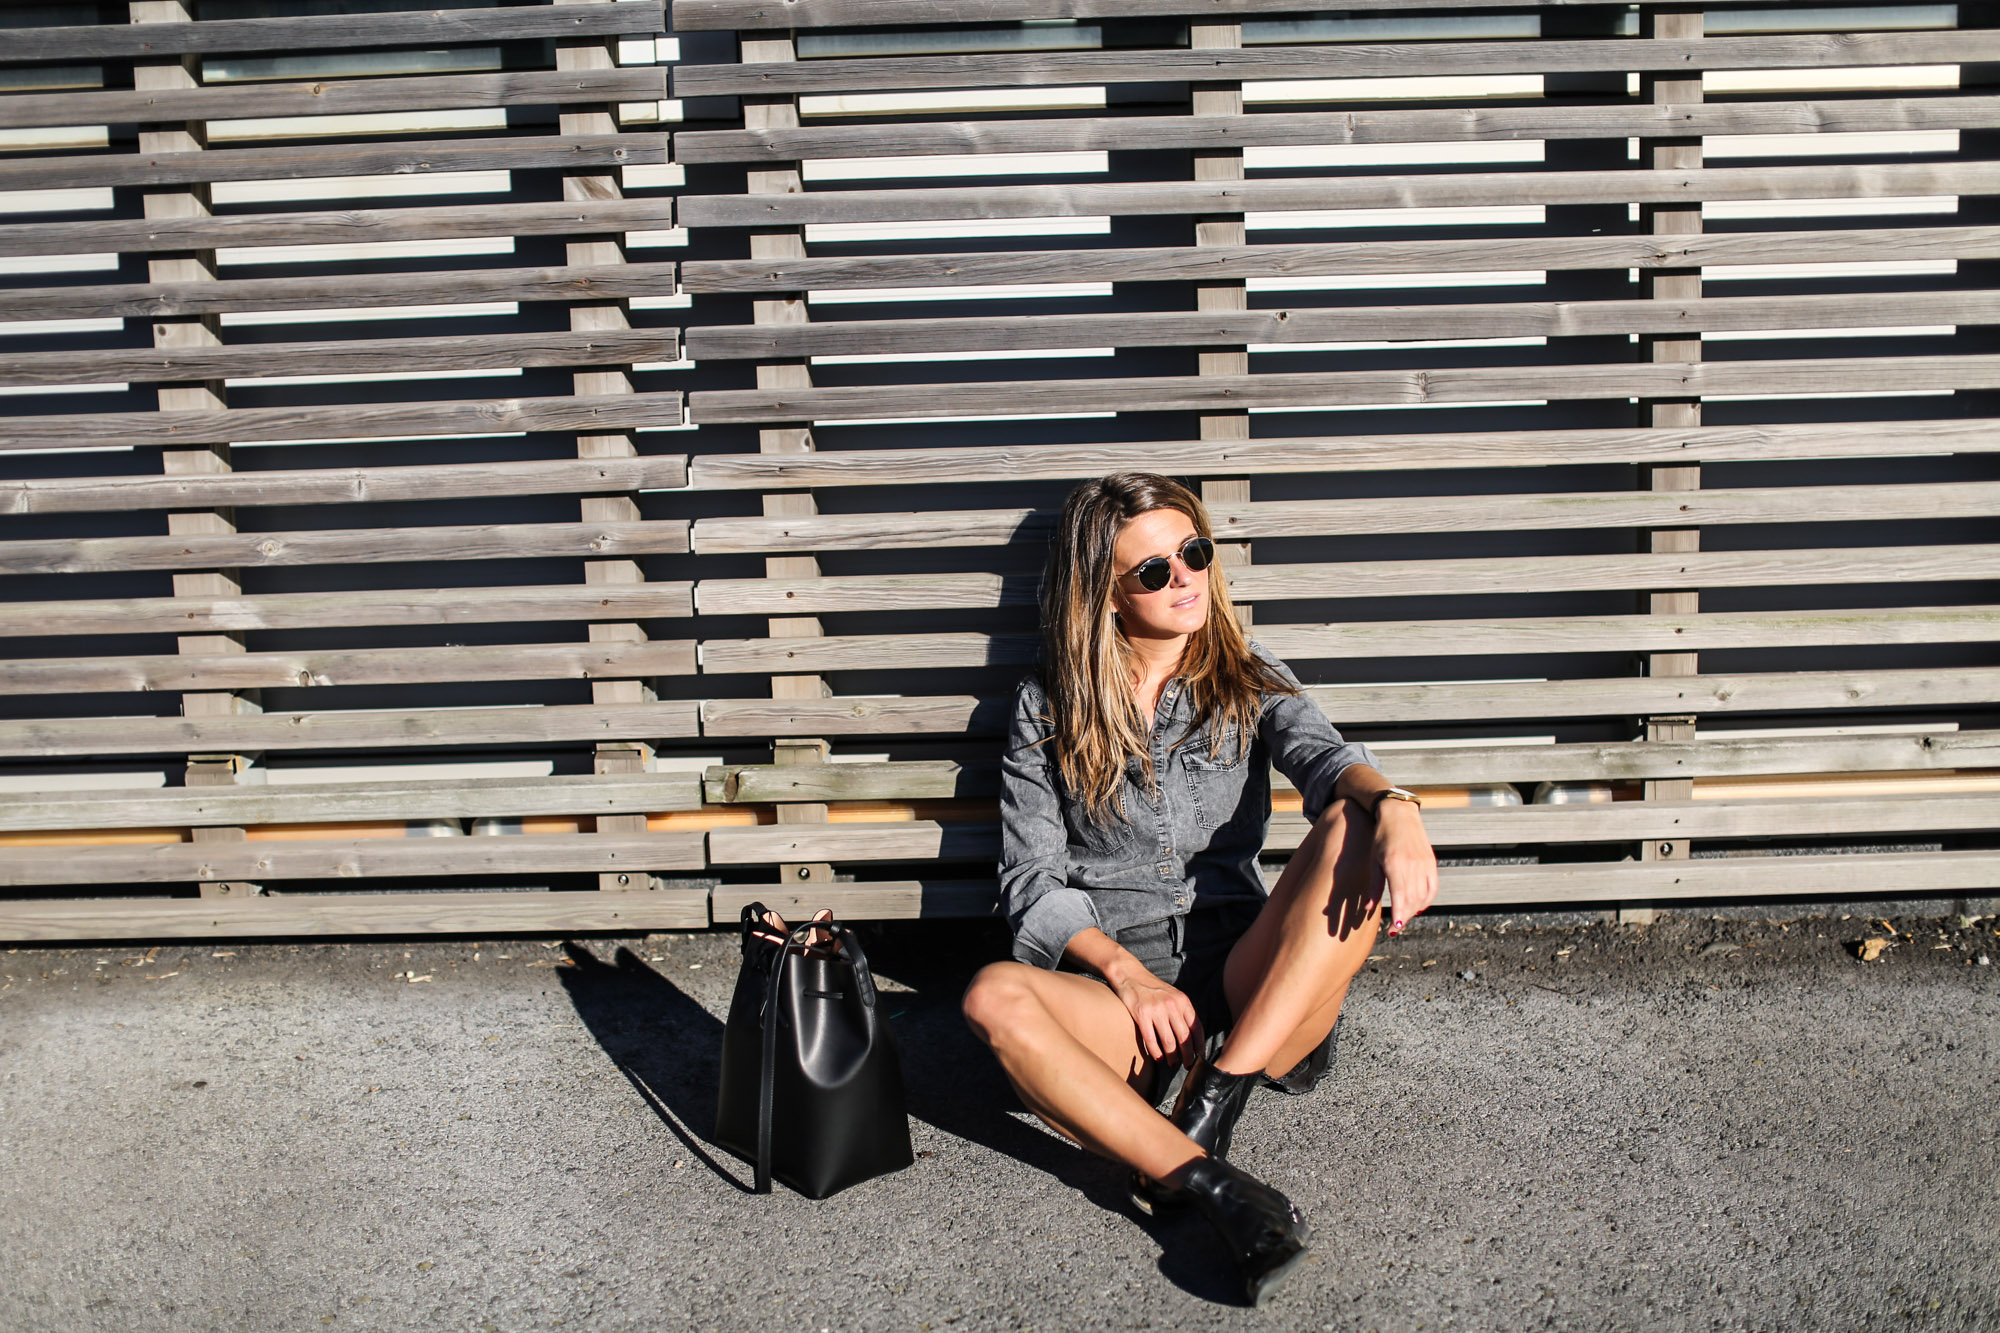 Clochet_streetstyle_levis_501_shorts_mansurgavriel_bucket_bag_larssonjennings_saxon_wathc-7